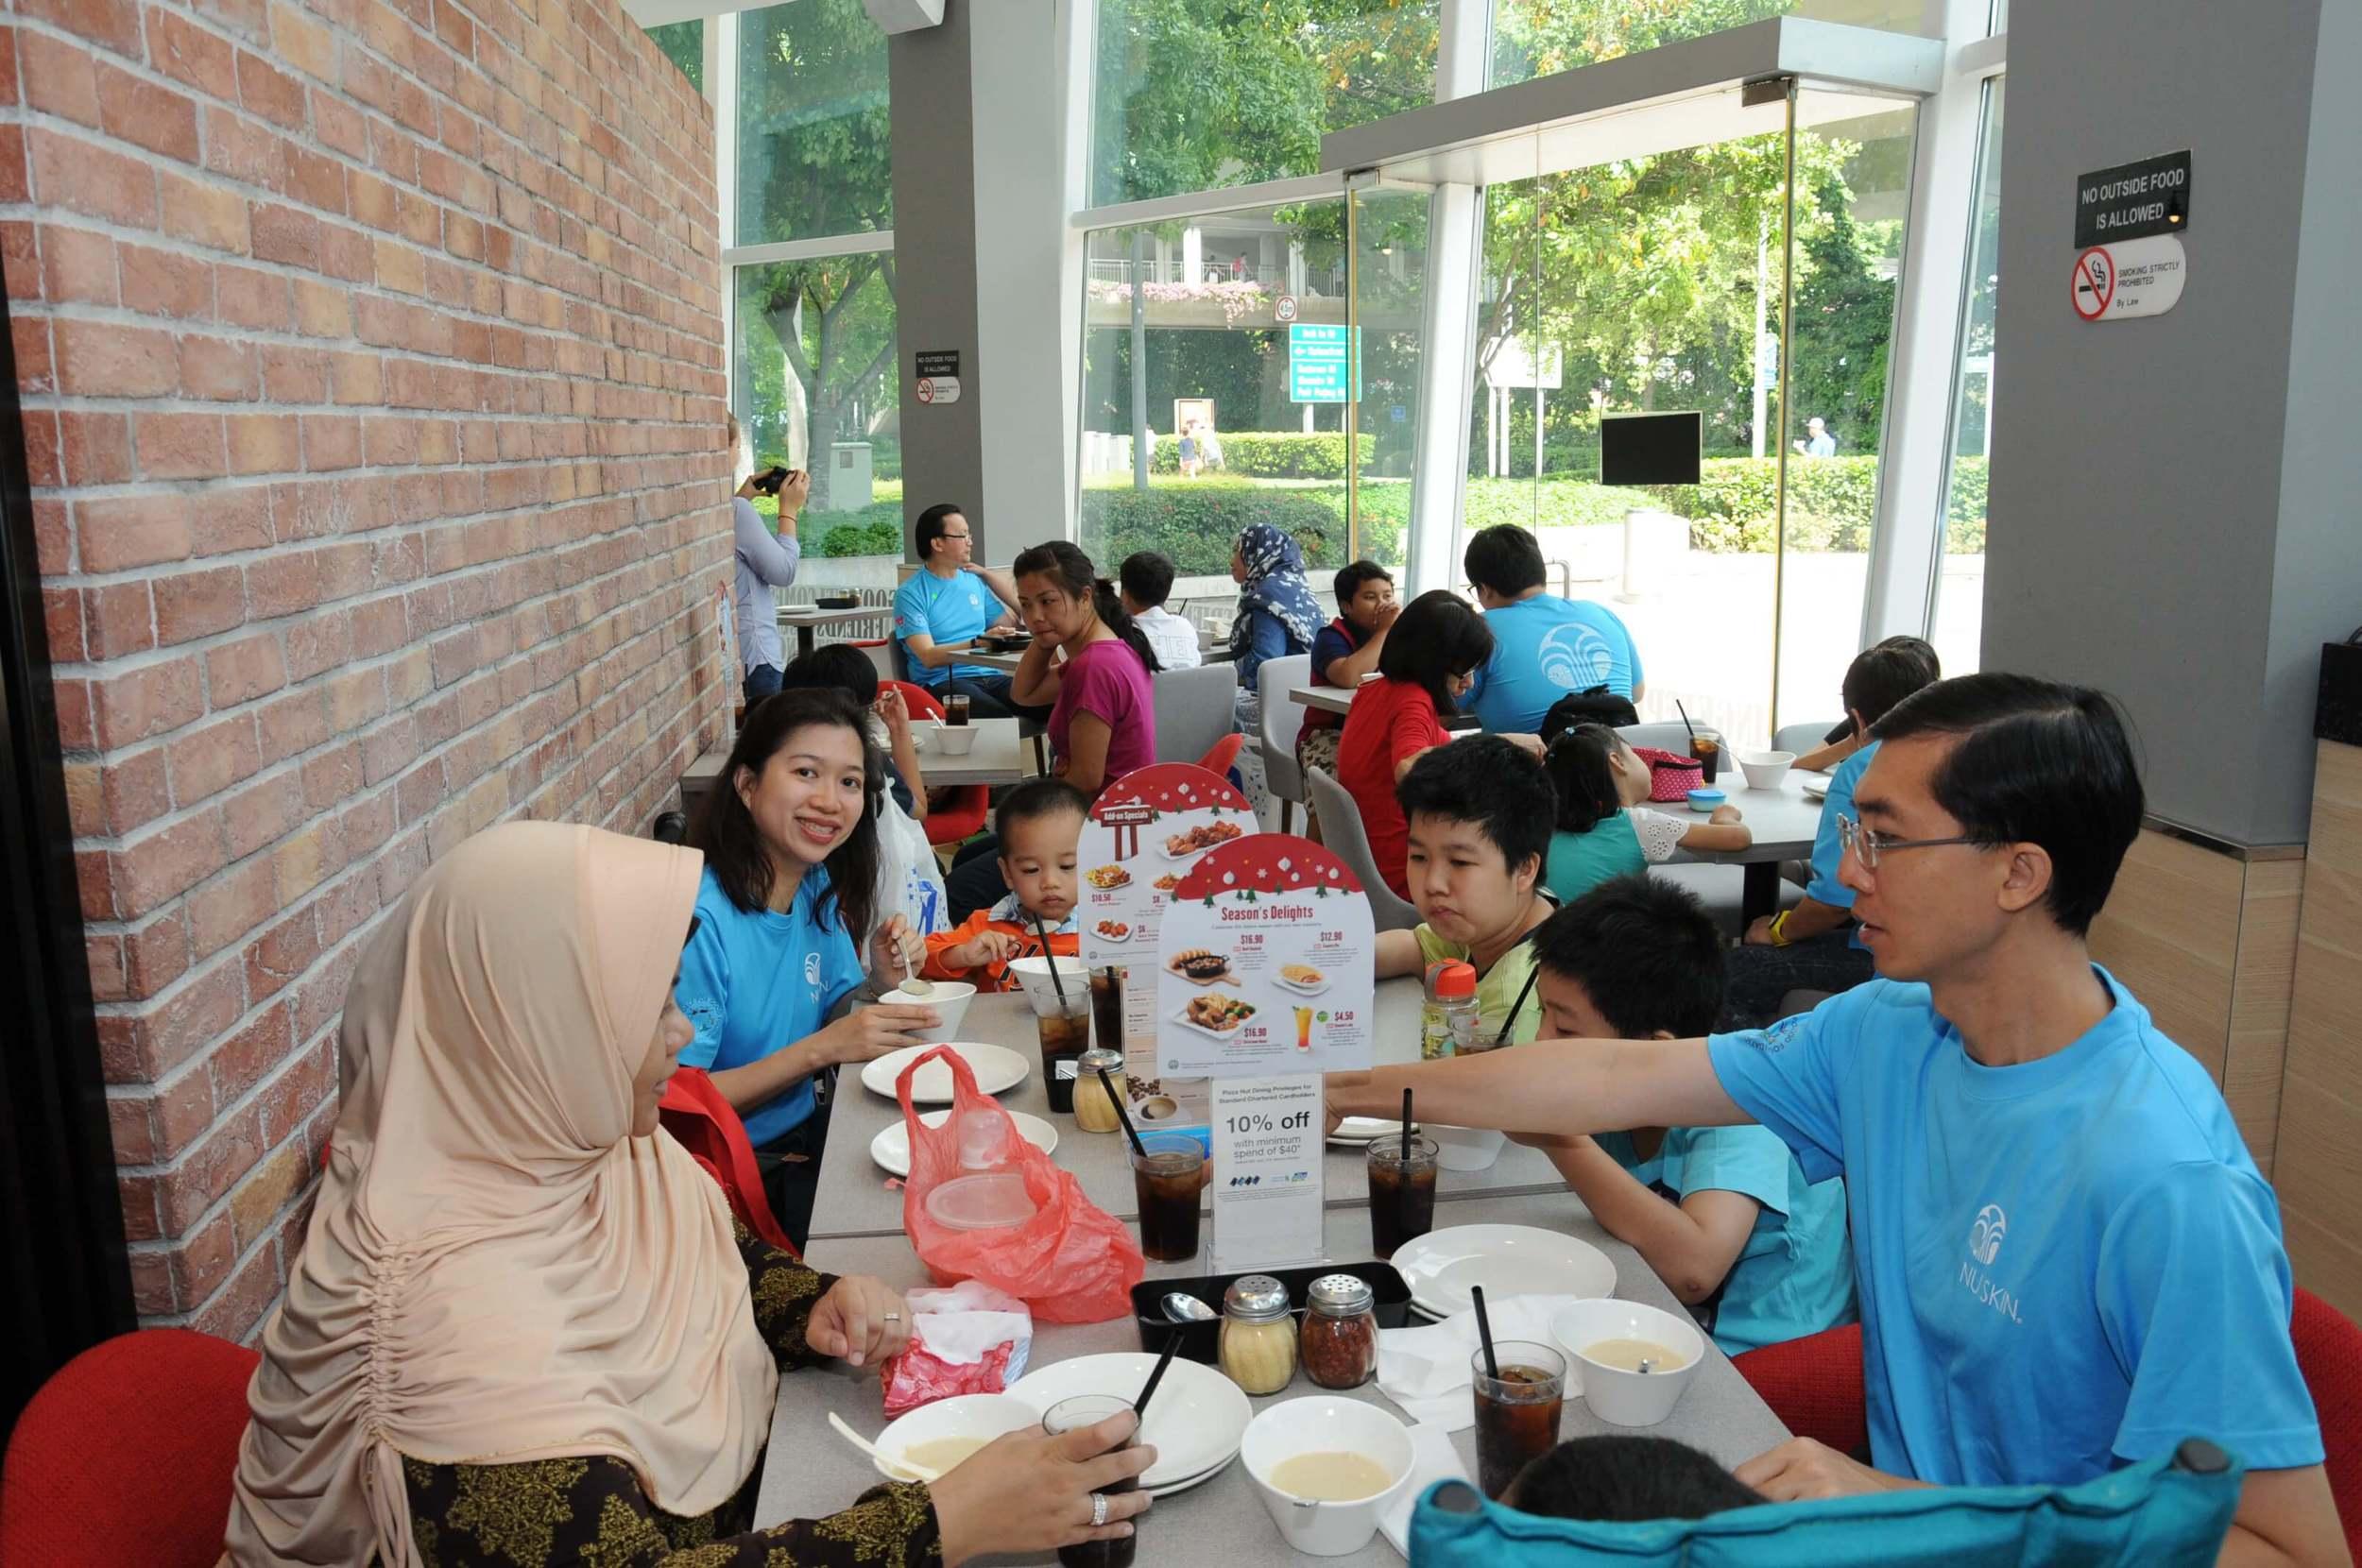 Club Rainbow Singapore Kris Kringle 2014-4.JPG